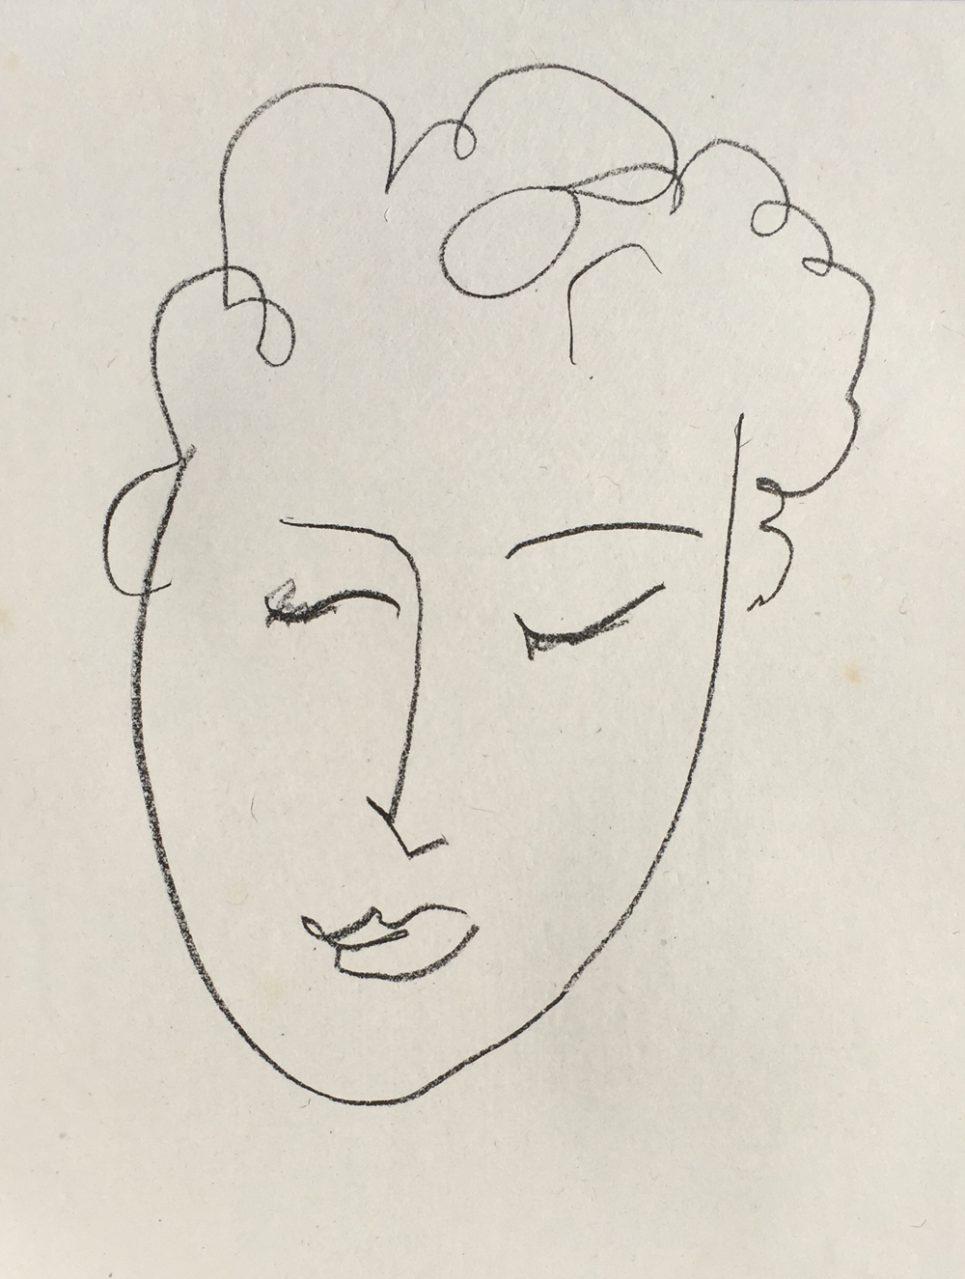 Henri Matisse - Jules Romains (from Pierres Levees)